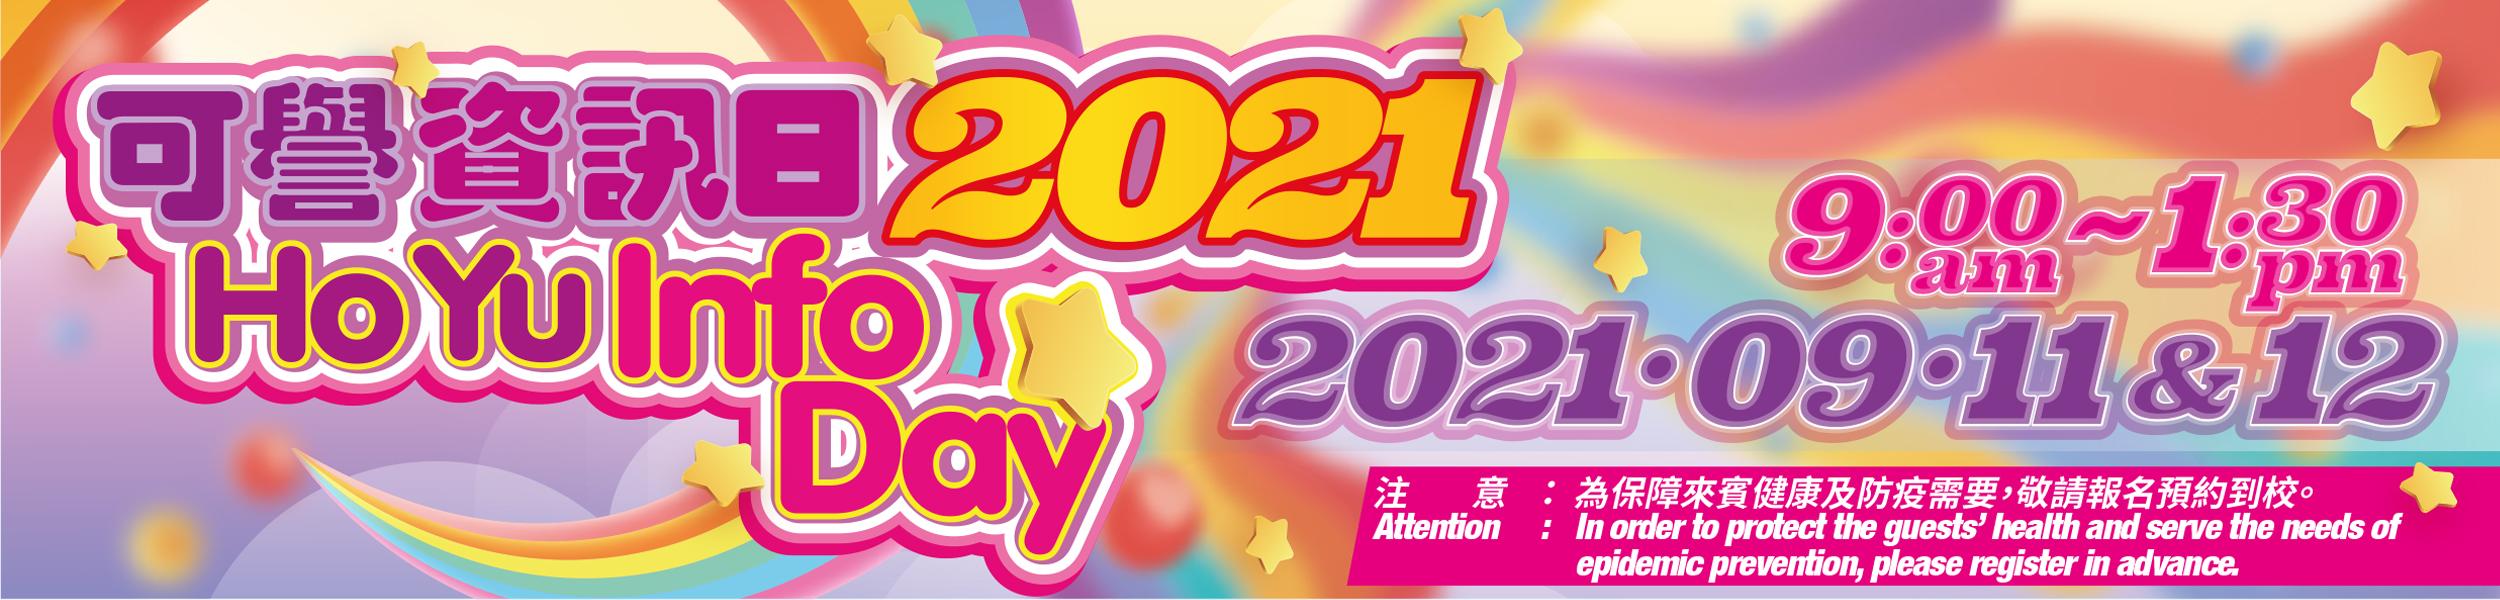 2021 Info Day